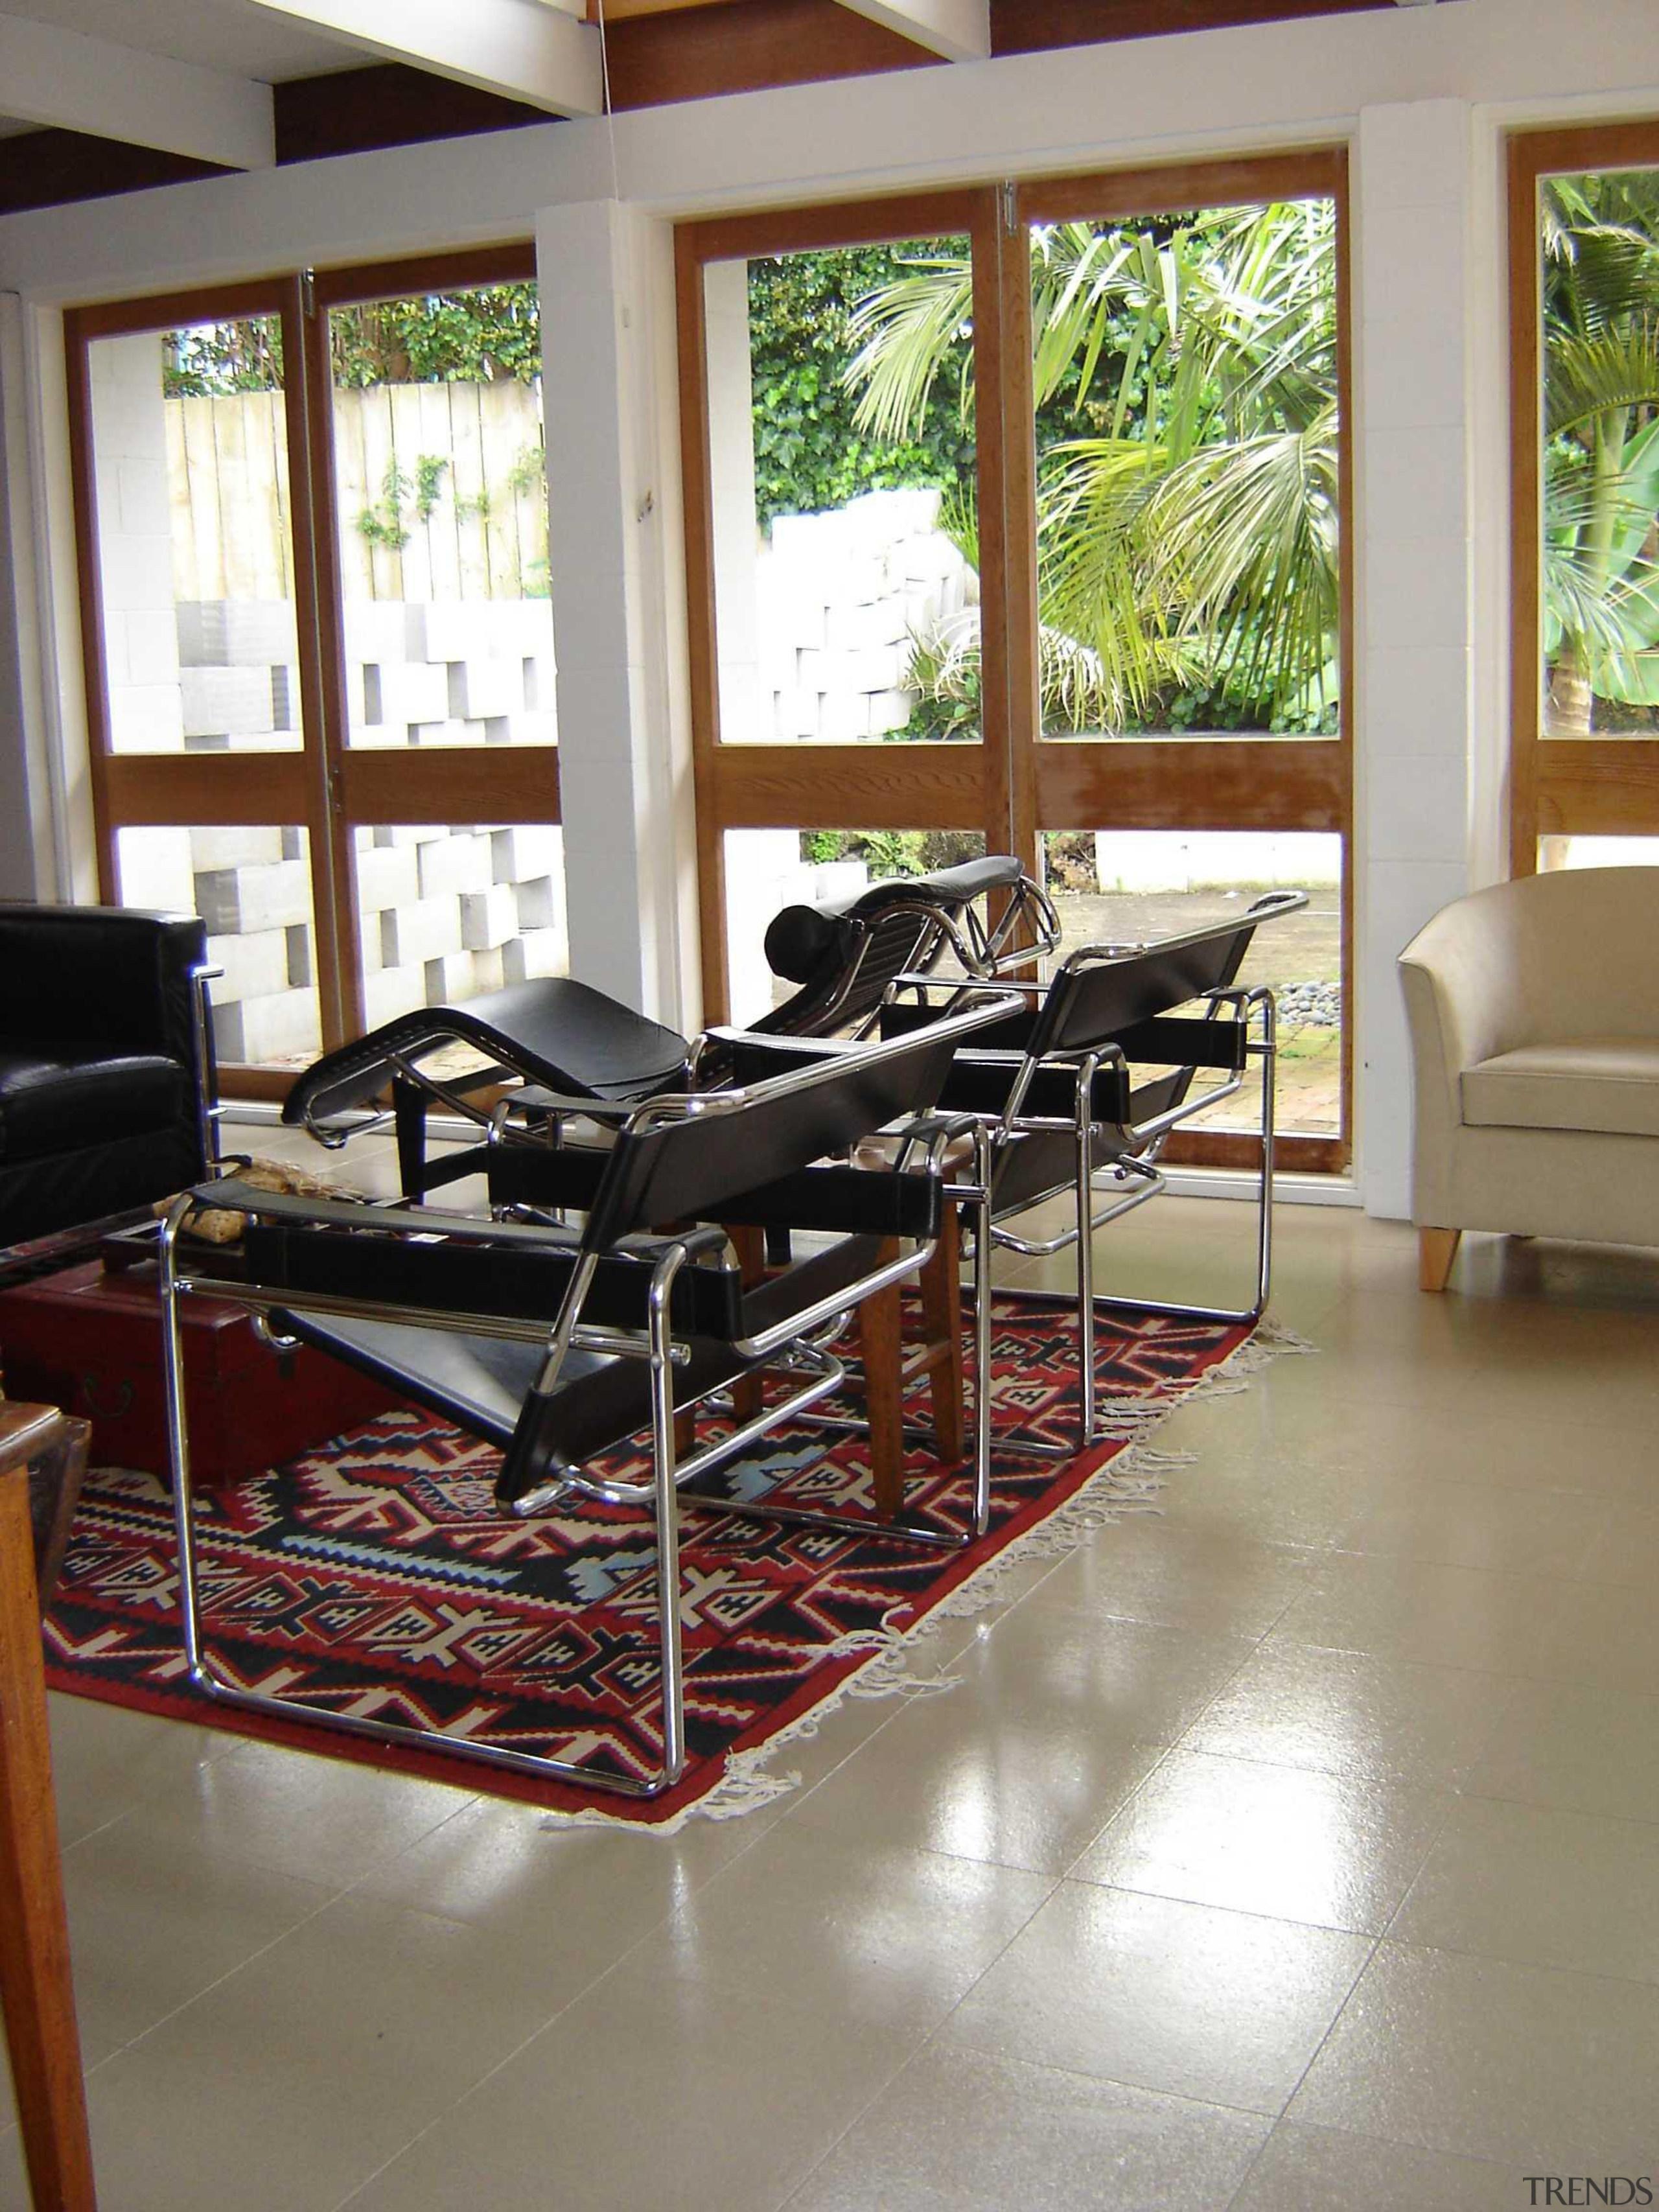 Cork Concepts provides luxury eco flooring in unlimited chair, floor, flooring, furniture, hardwood, interior design, living room, table, window, wood, wood flooring, gray